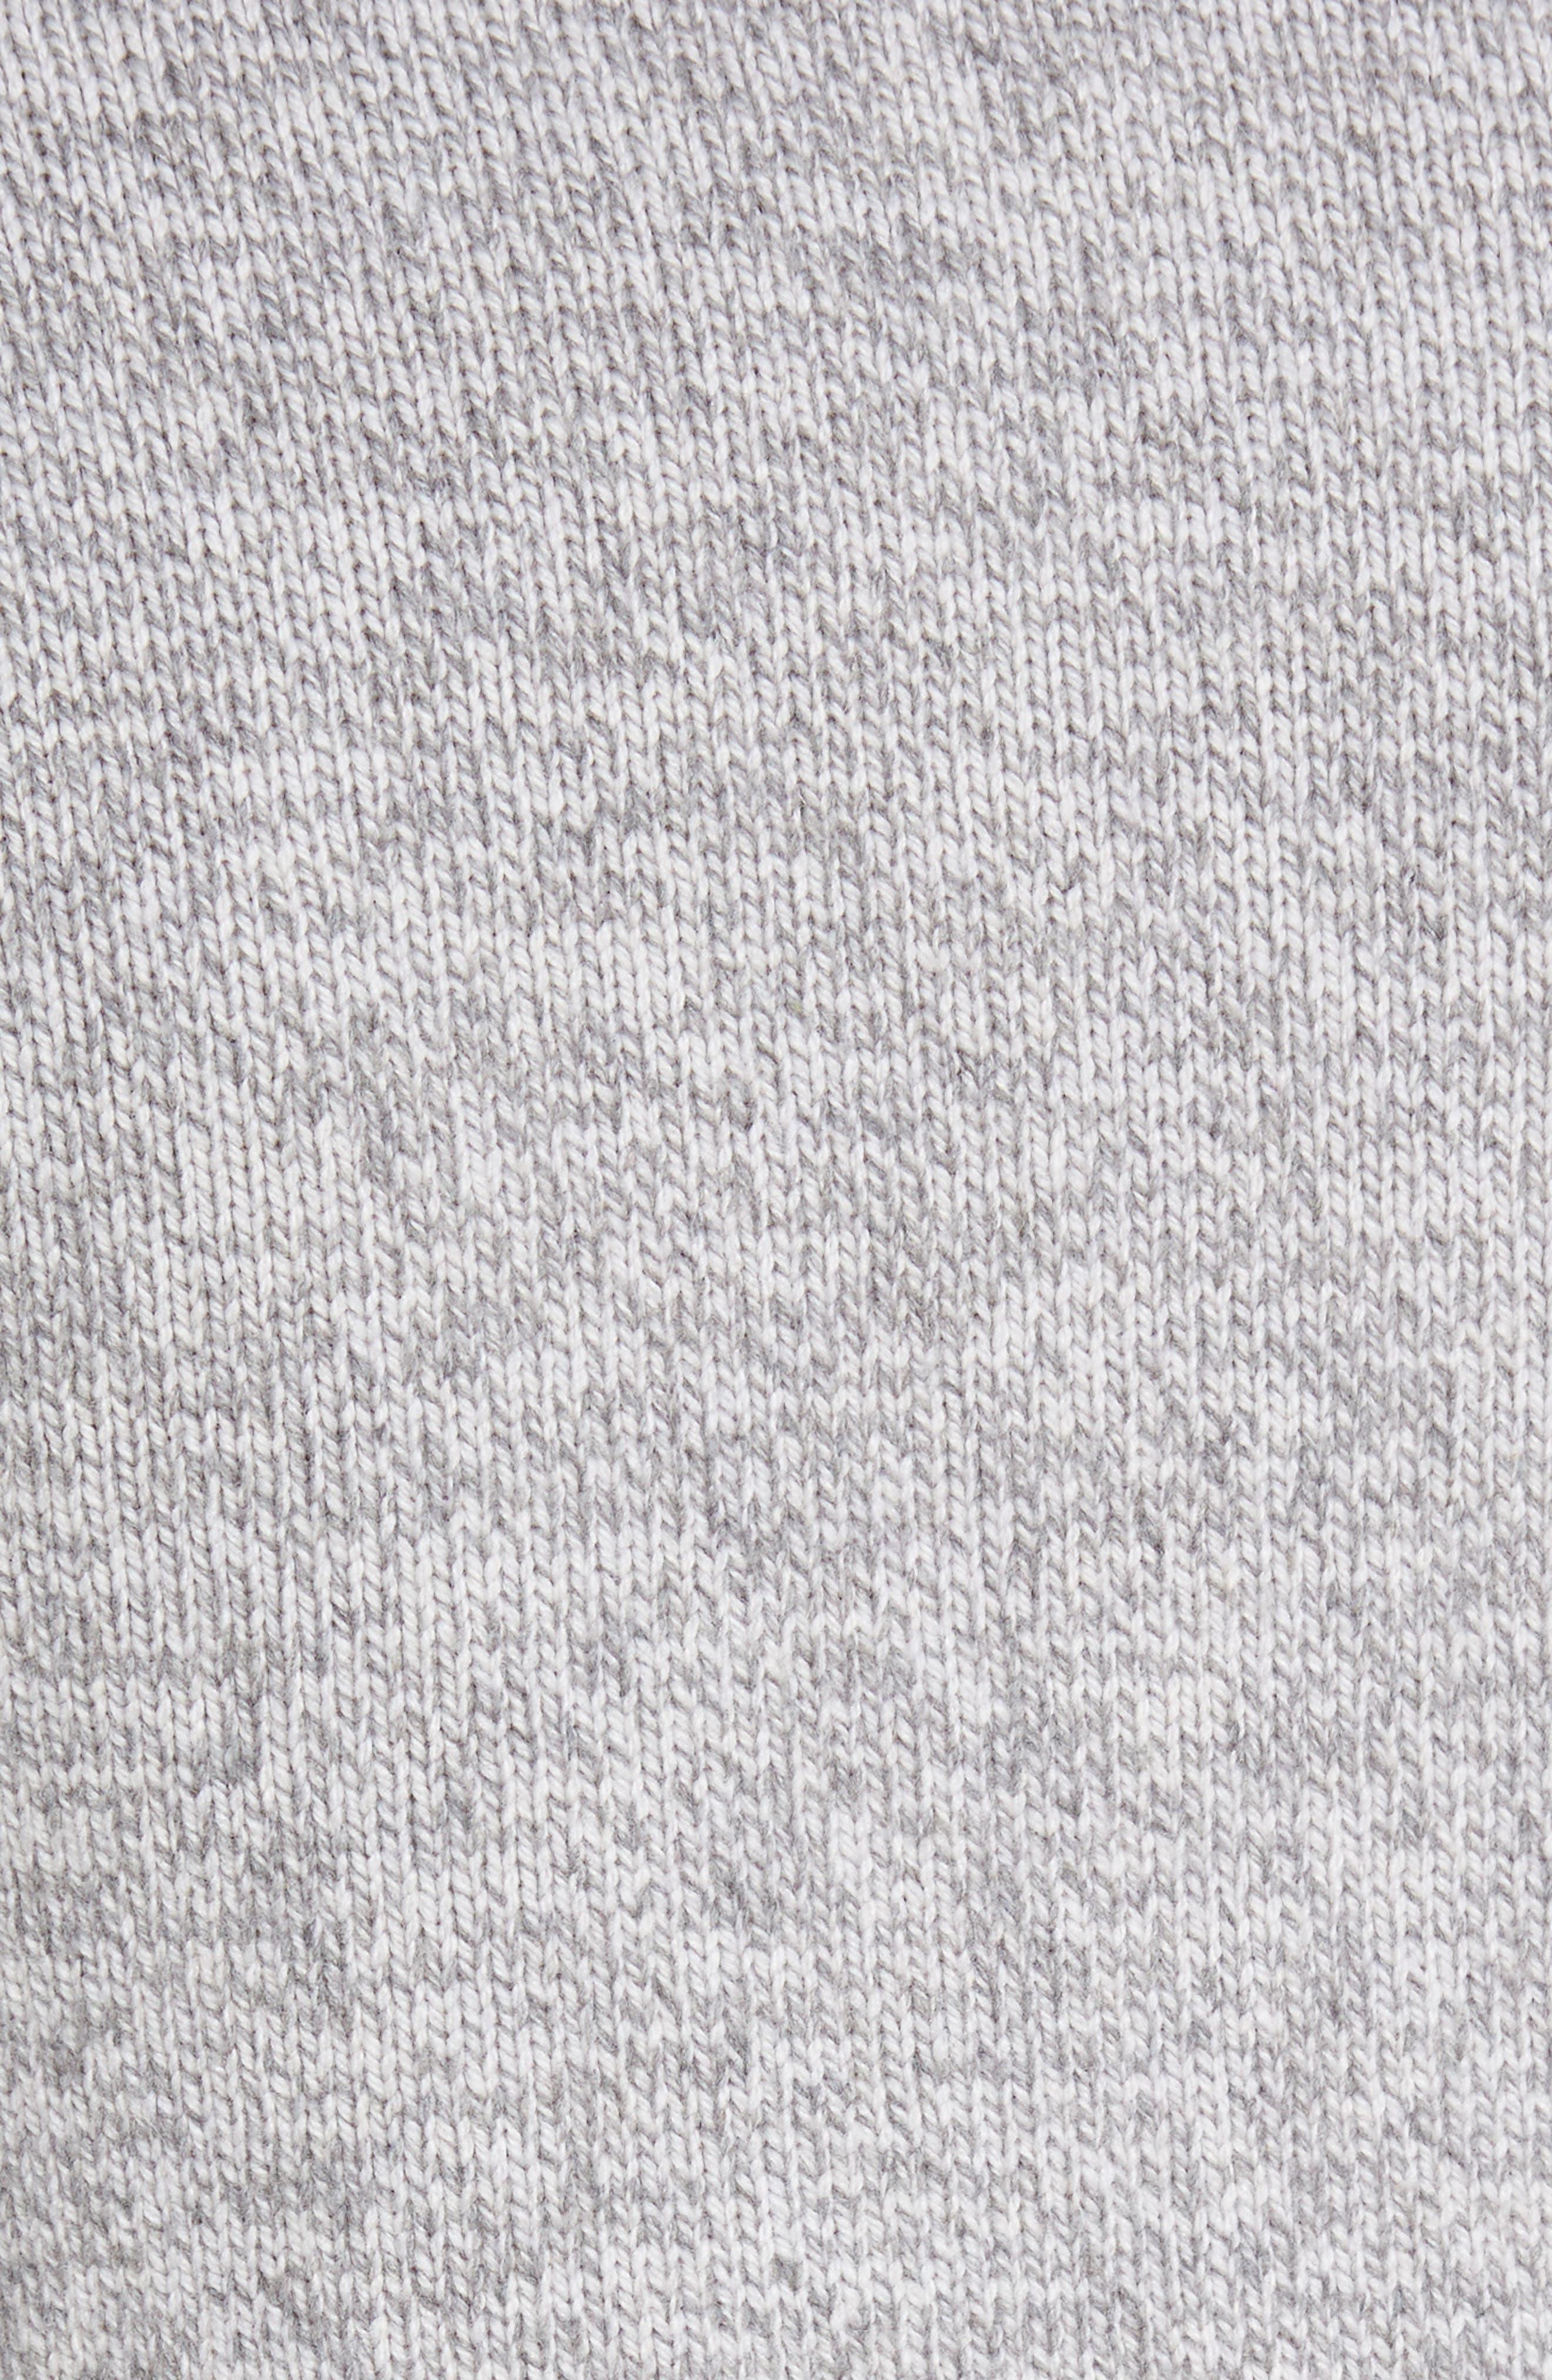 Marled Turtleneck Sweater,                             Alternate thumbnail 5, color,                             054